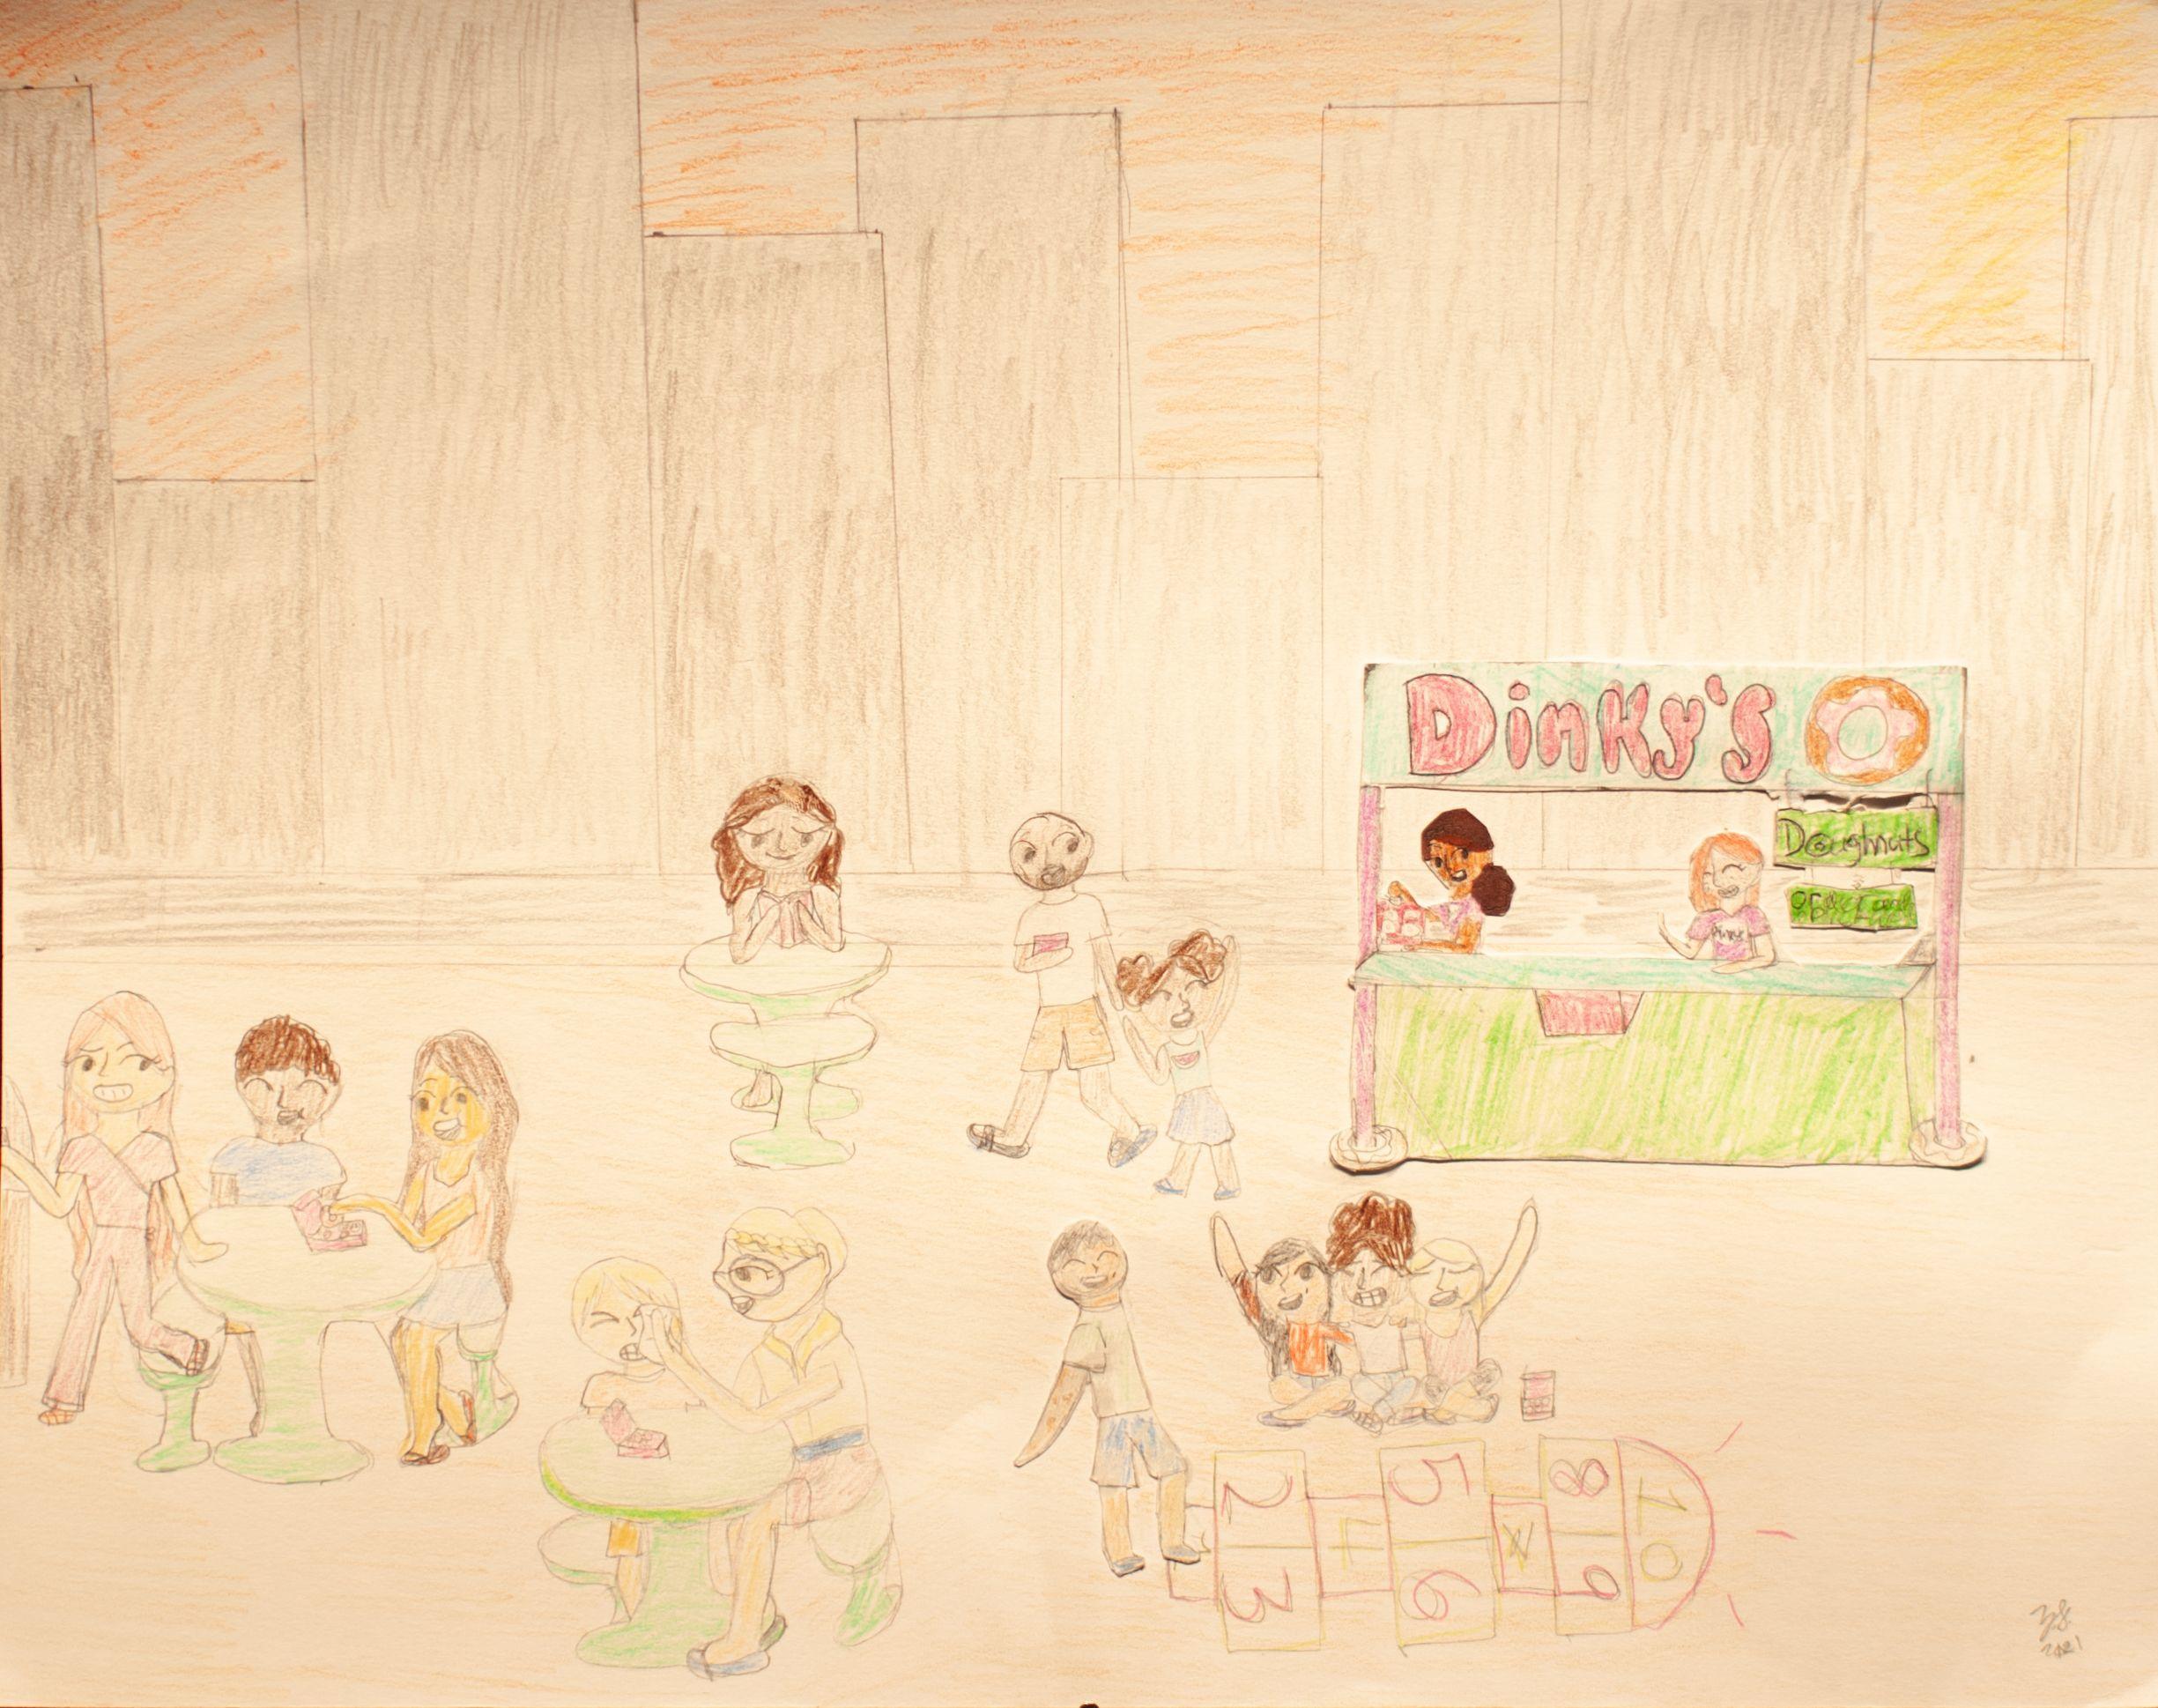 """A Day at Dinky's Donuts"" - Zeren Sebcioglu"